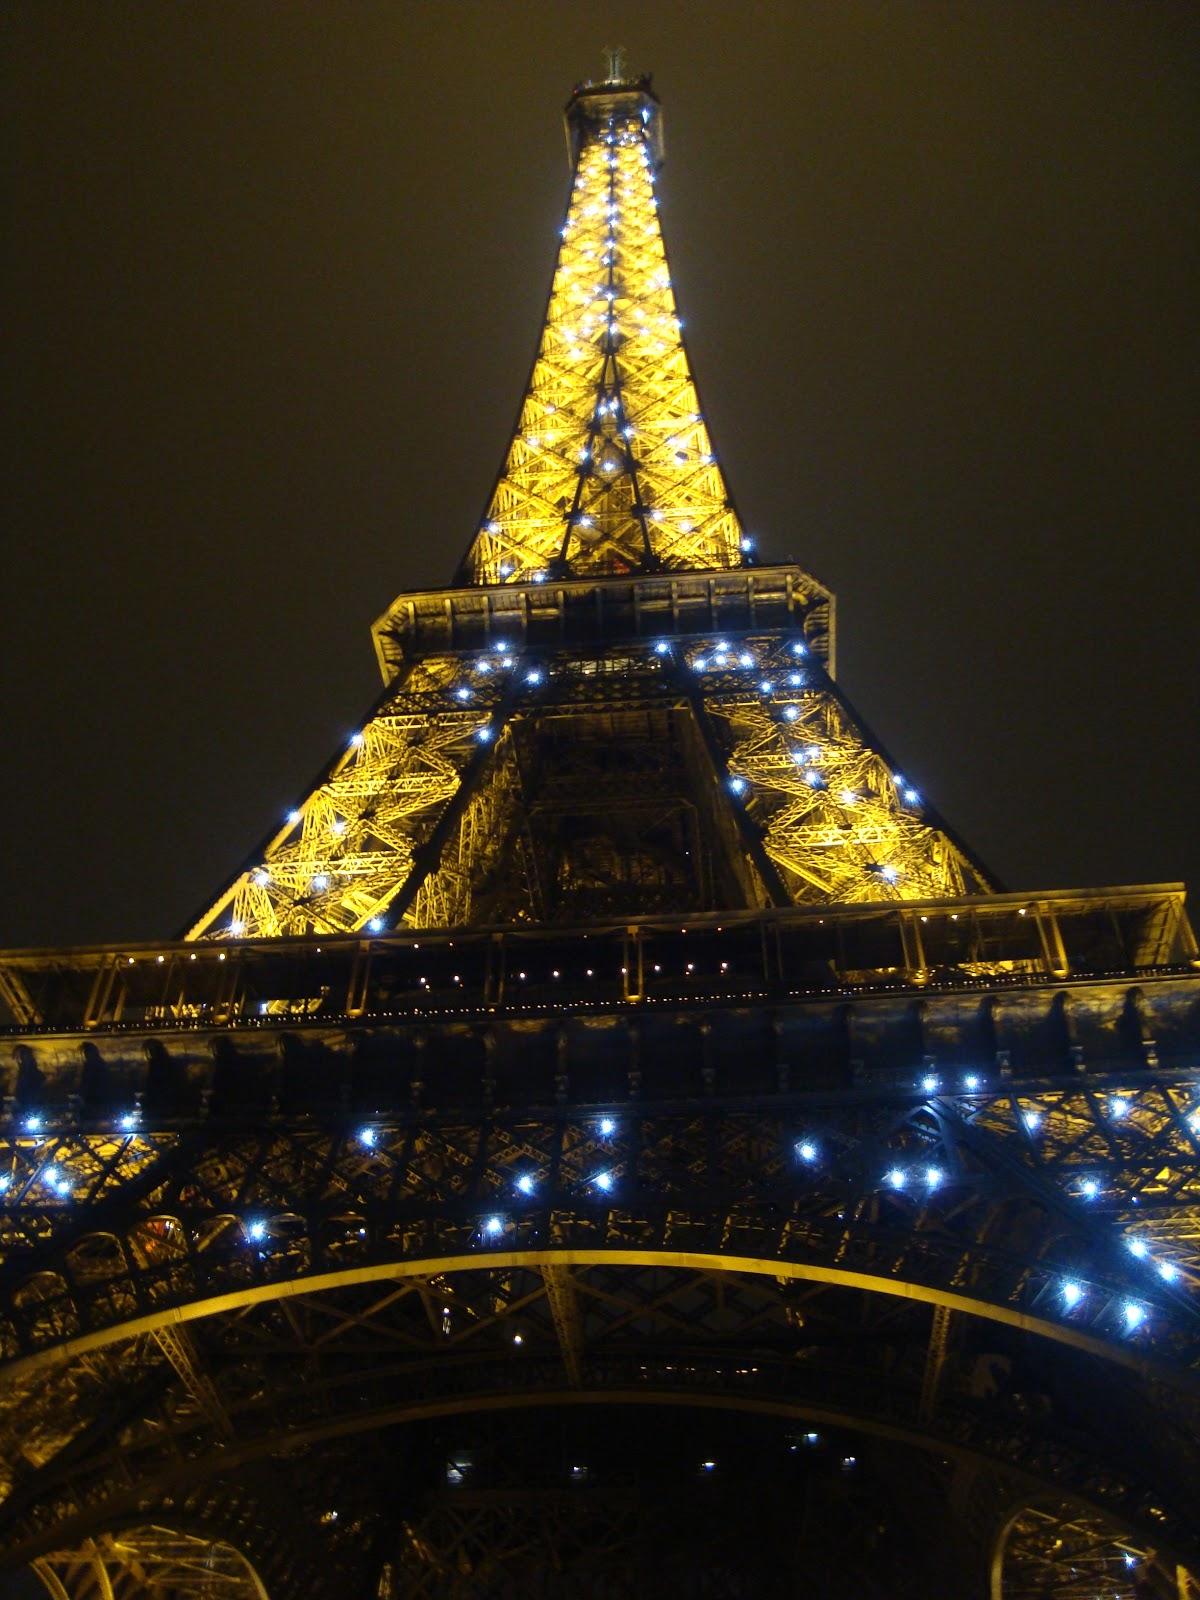 Denis s Blog: Twinkle lights - Eiffel Tower